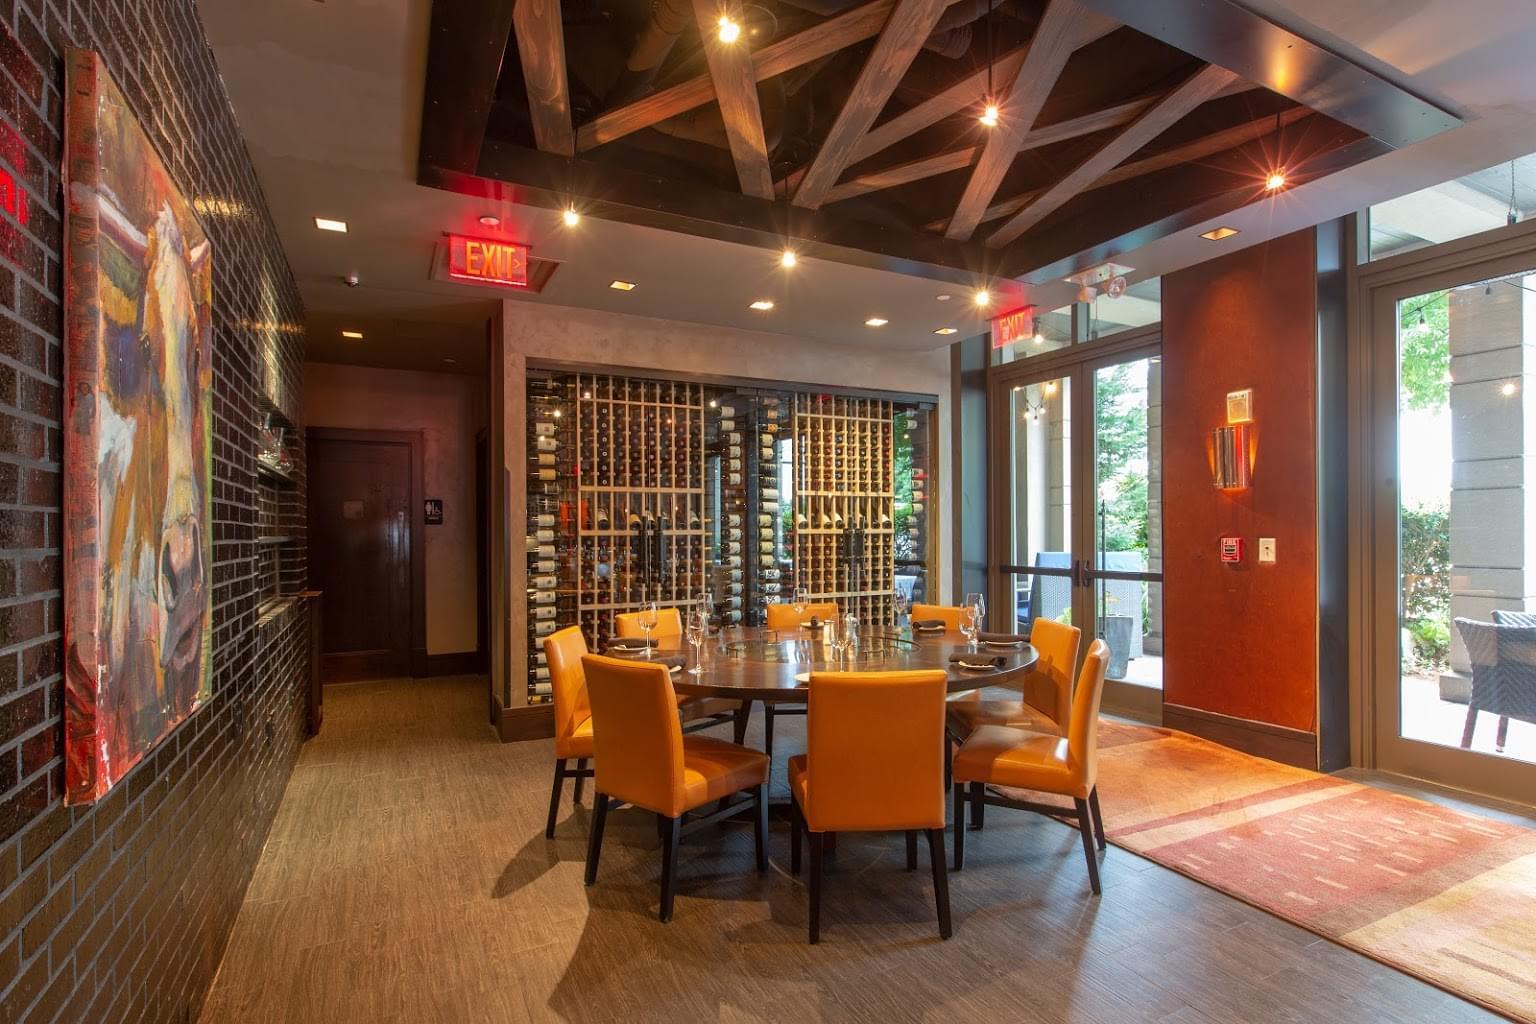 Del Frisco's Grill Steak House in Atlanta, GA